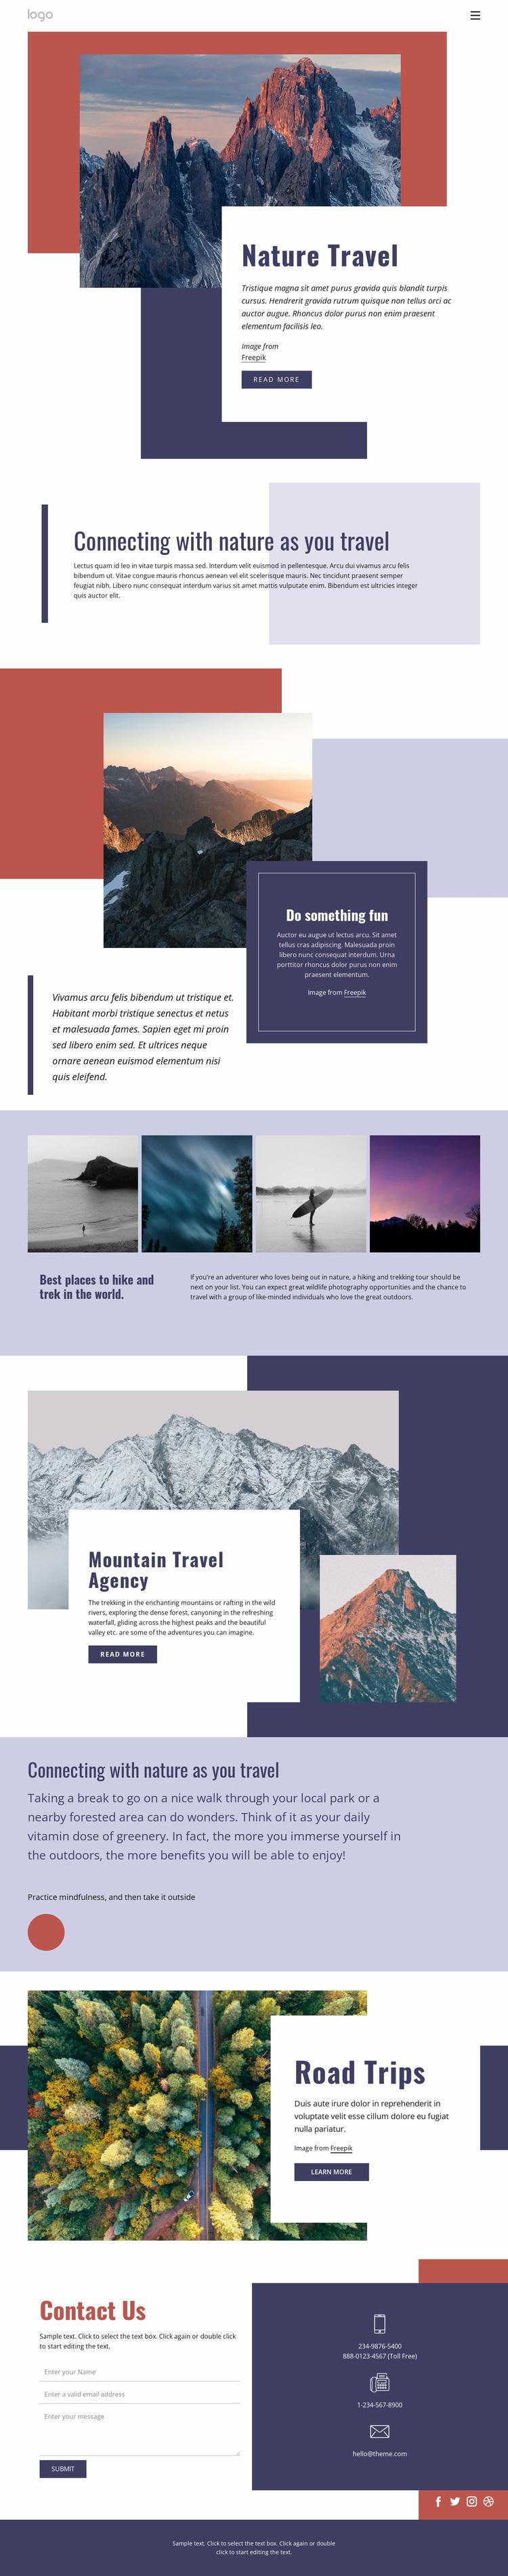 Nature travel Website Design